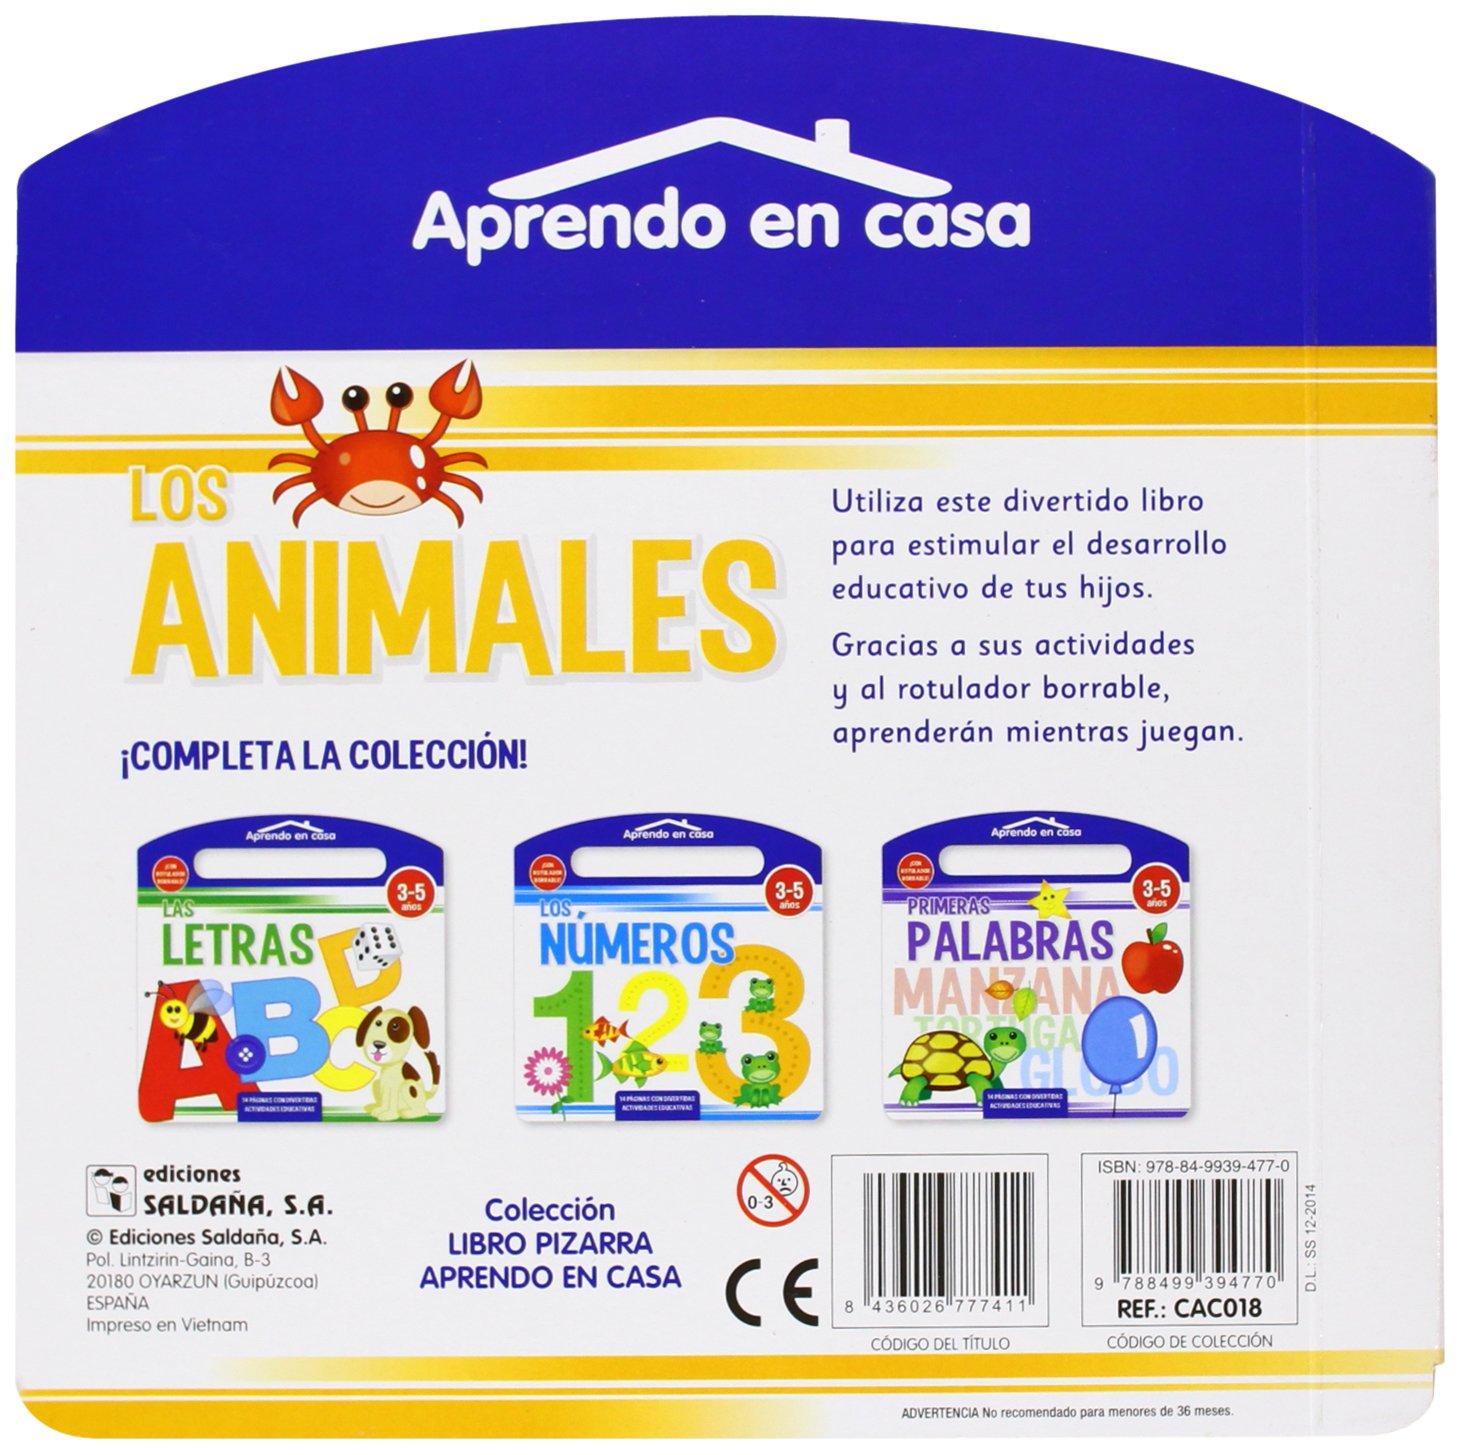 Los animales: CAC018/394770: 9788499394770: Amazon.com: Books